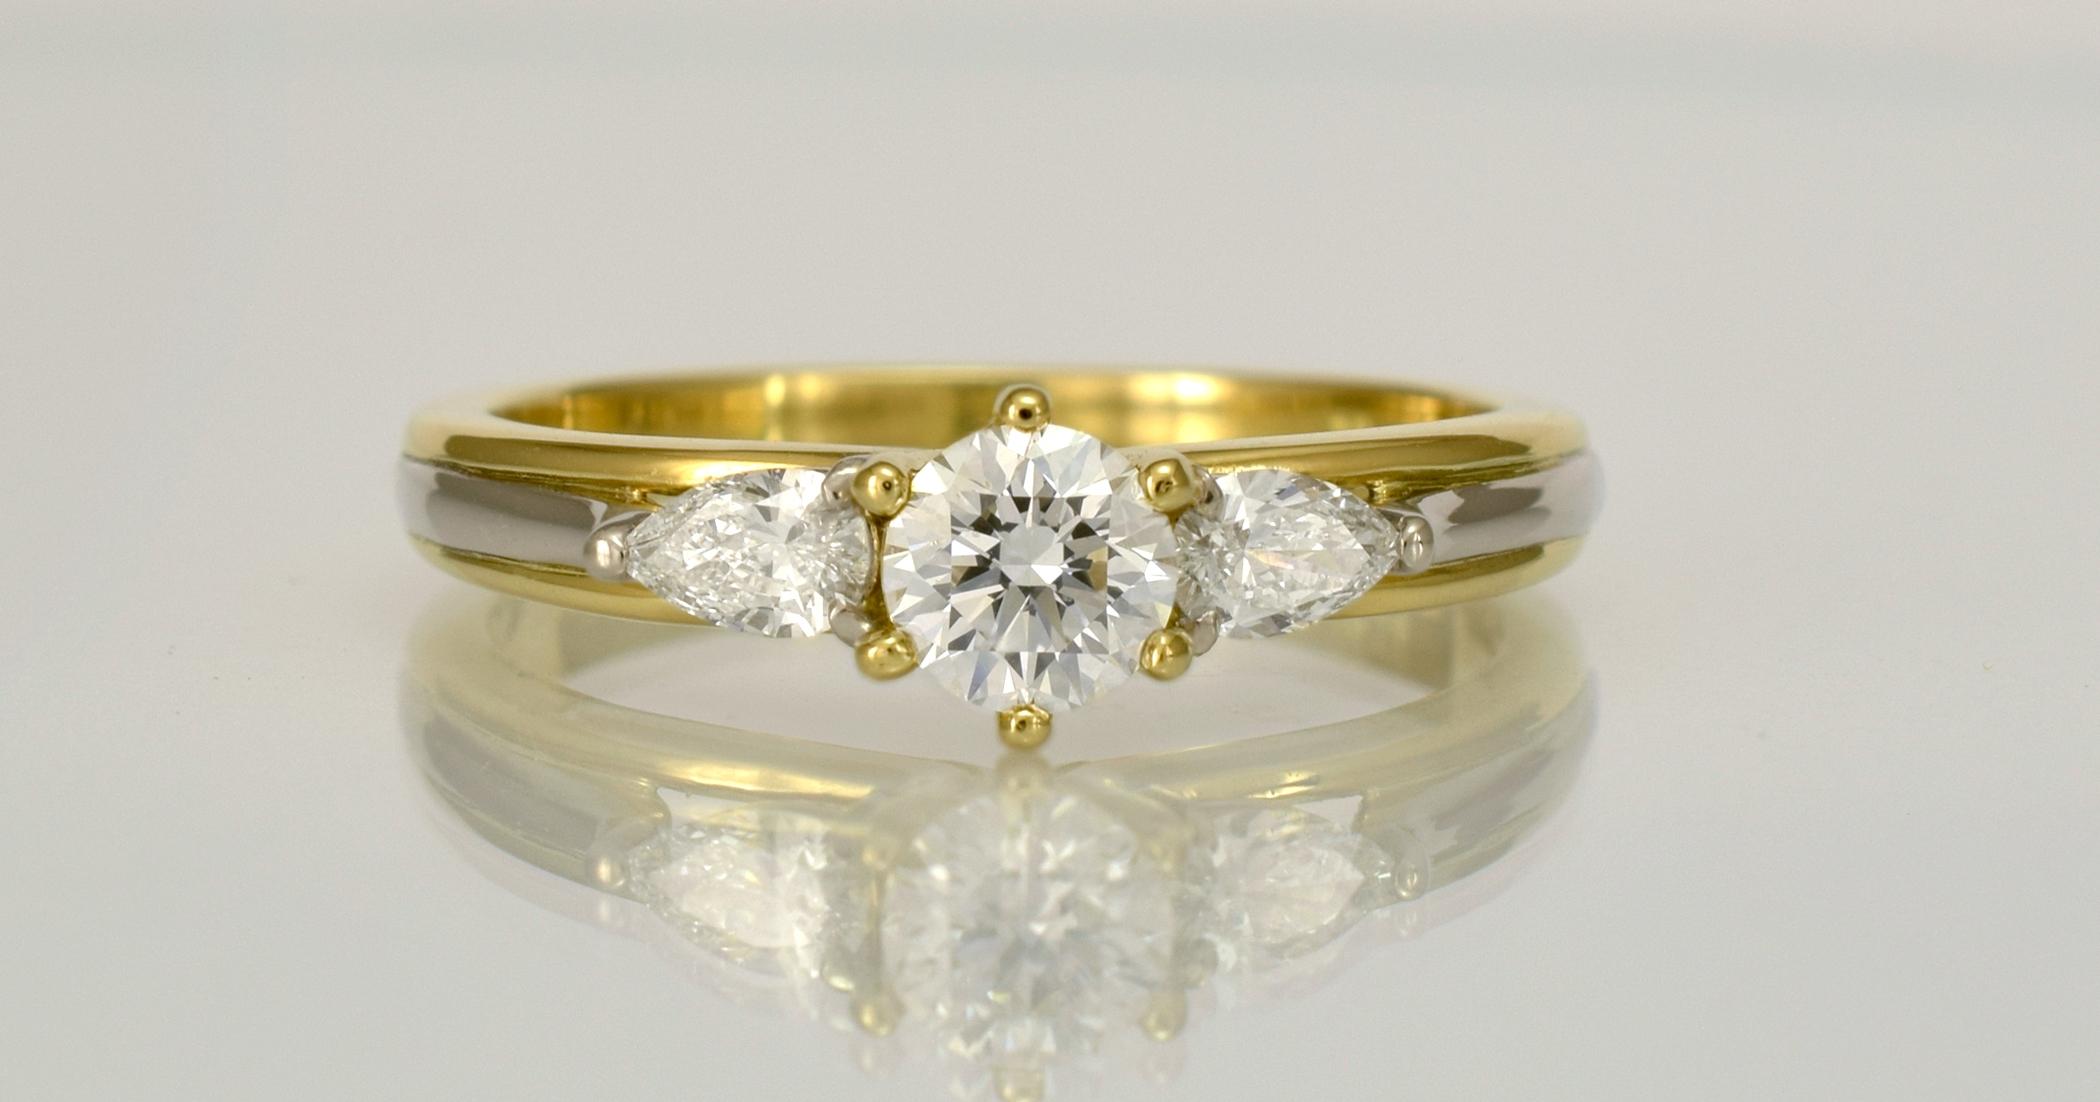 DR483 - 18ct gold alloys, .40ct main diamond with 2 x .125carat accent diamonds.